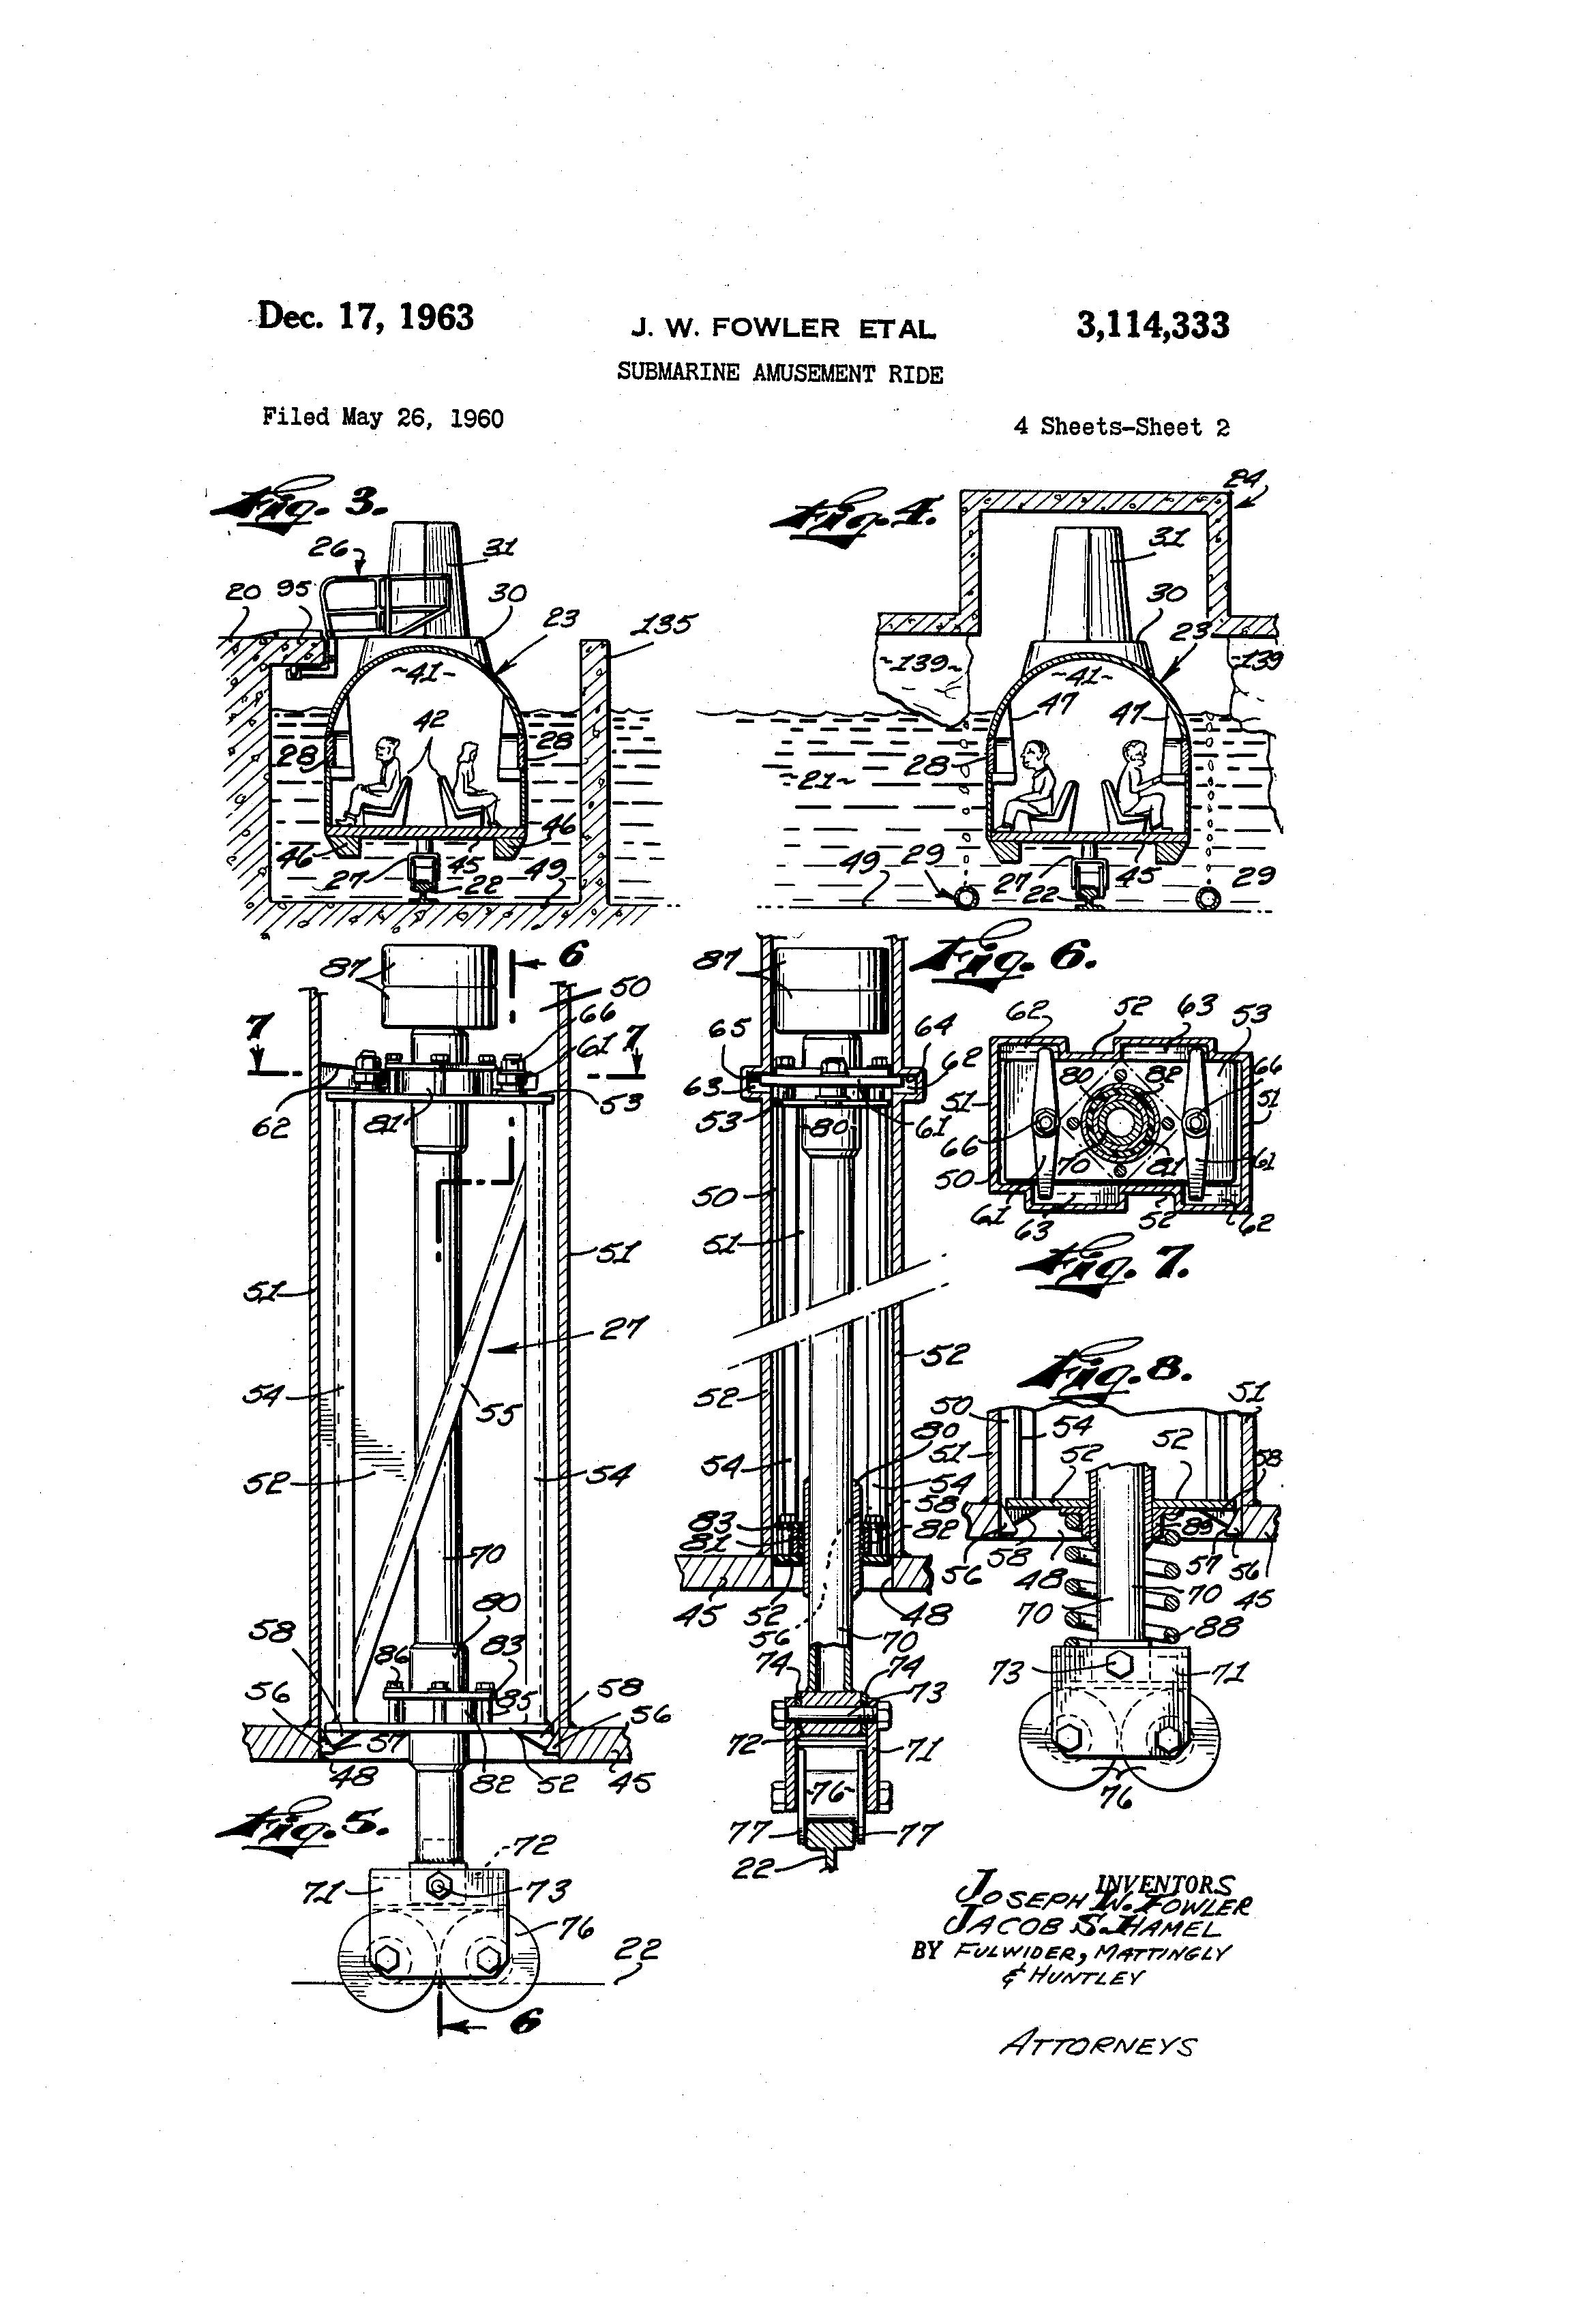 Submarine Amusement Ride Patent Illustration from  Google Patents.